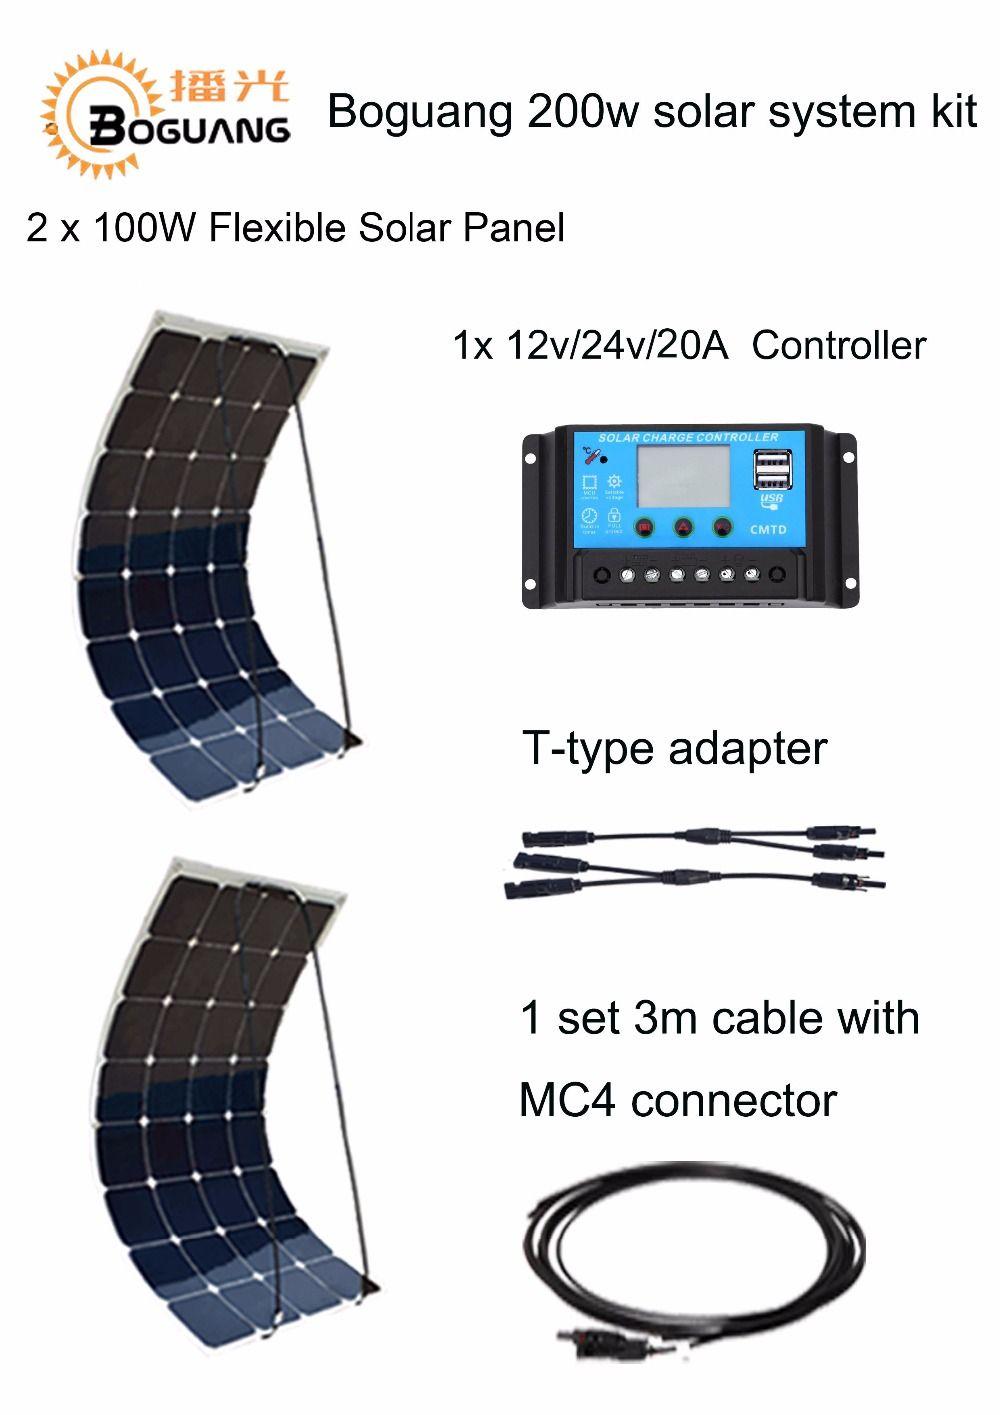 Flexible Solar panel 2pcs 100W cable 12V or 24V 20A solar controller USB output house 200W Kits DIY System solar power station